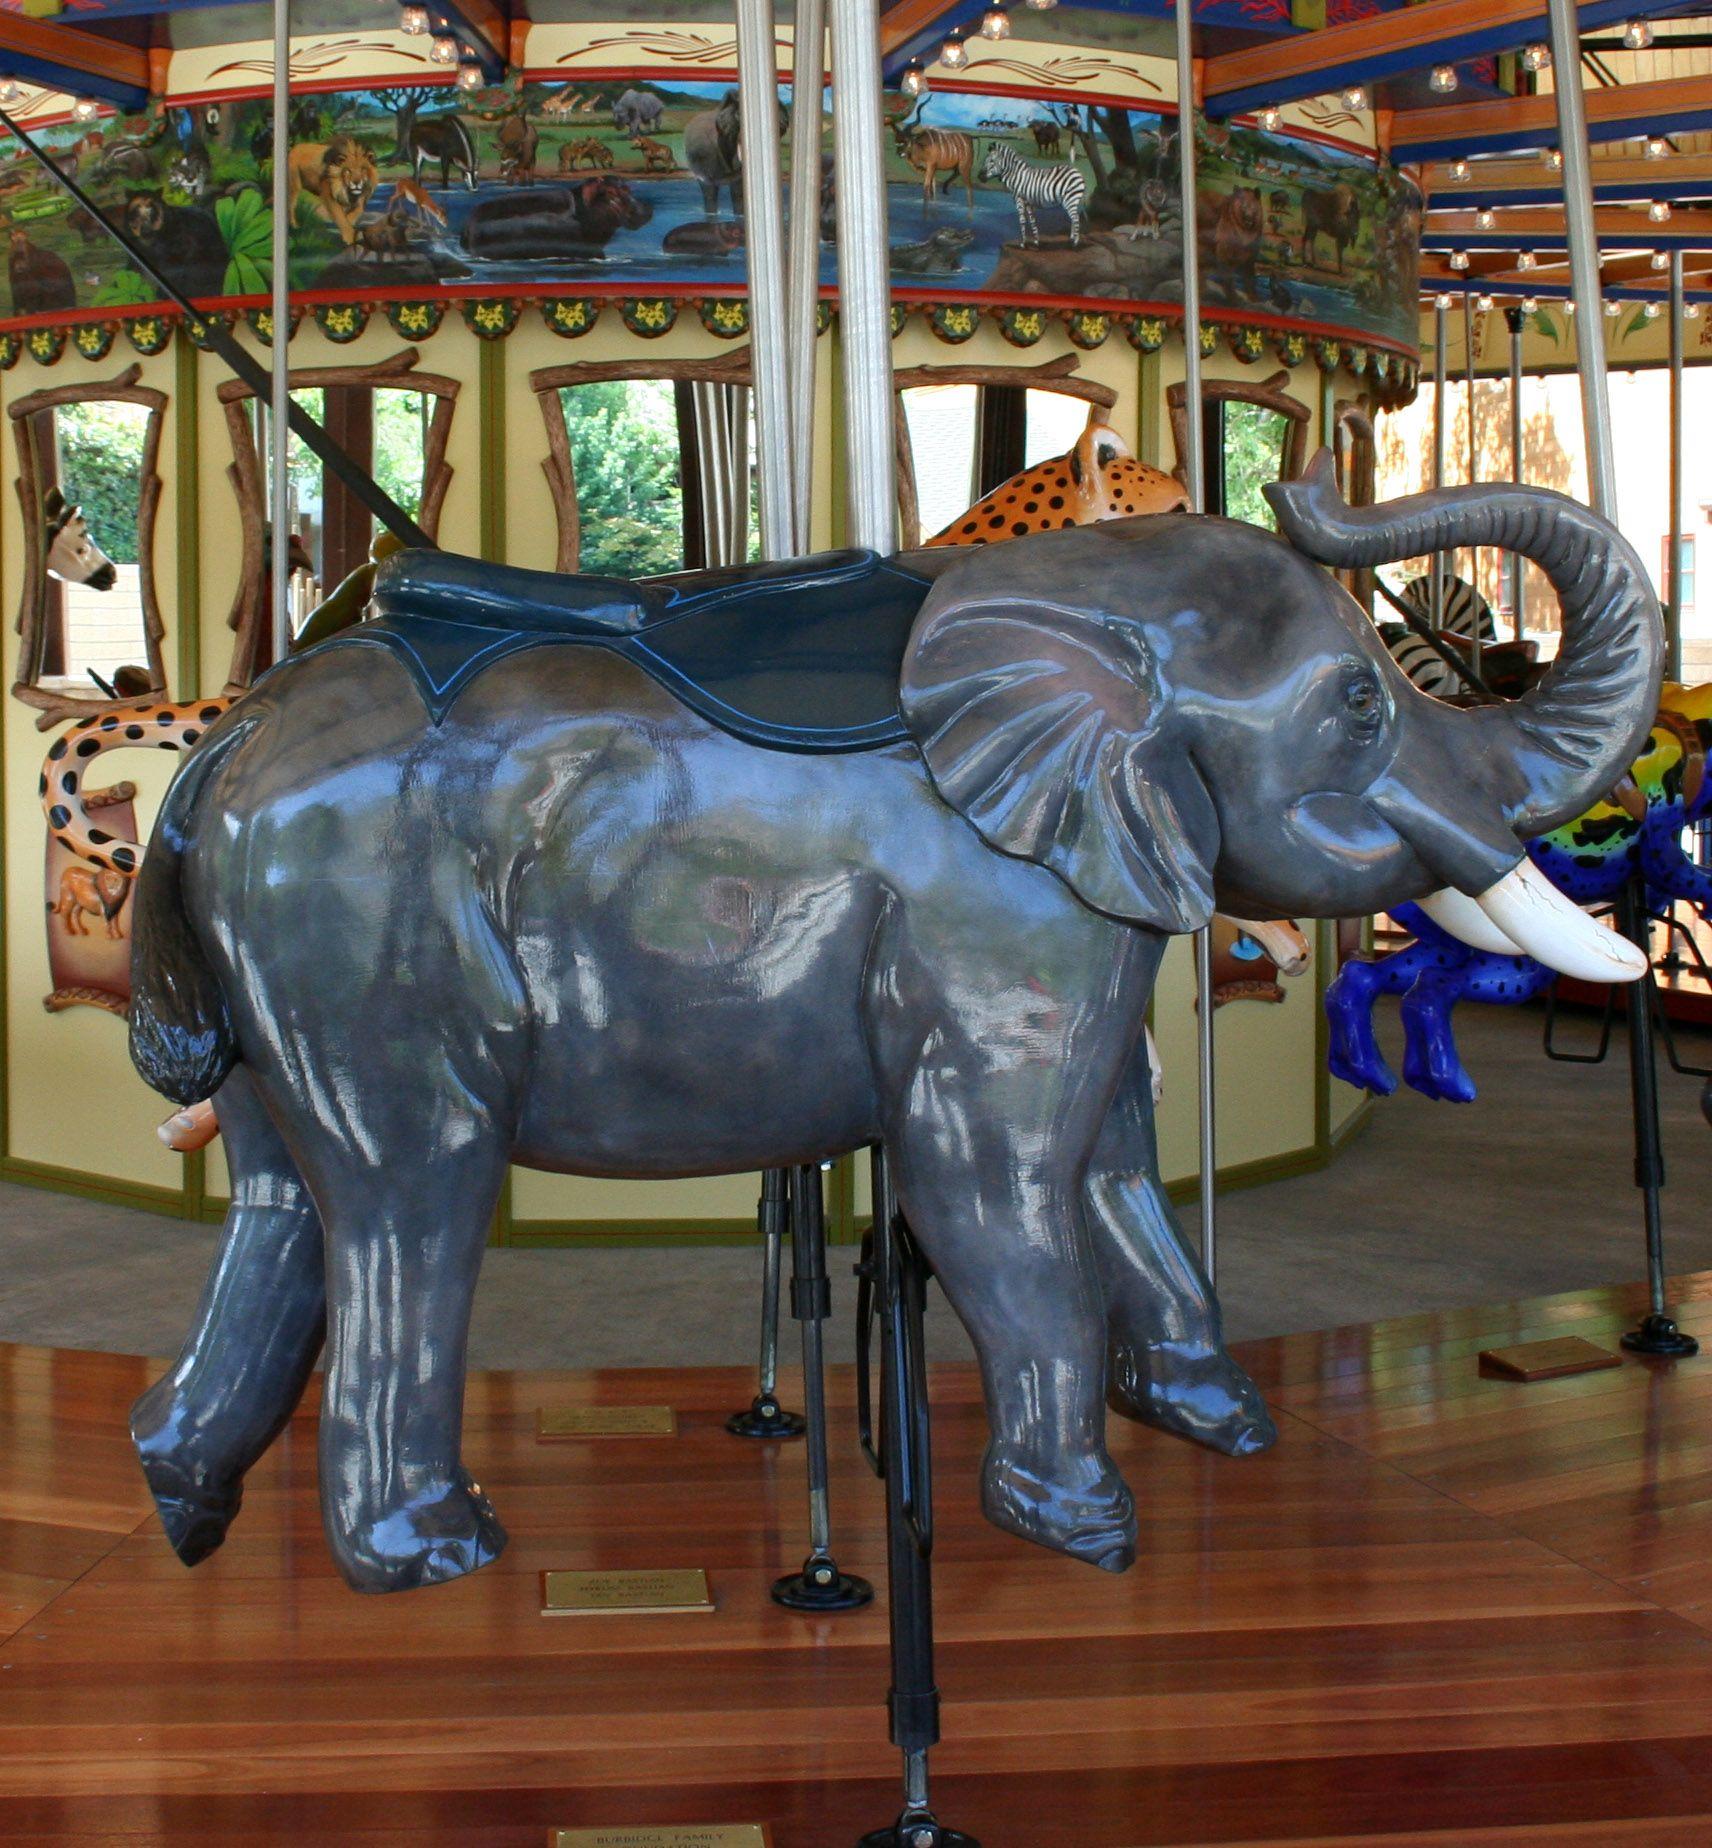 National carousel association denver zoo carousel african wild dog - Nice Big Bulky Elephant On The Carousel In Hogle Zoo Salt Lake City Utah